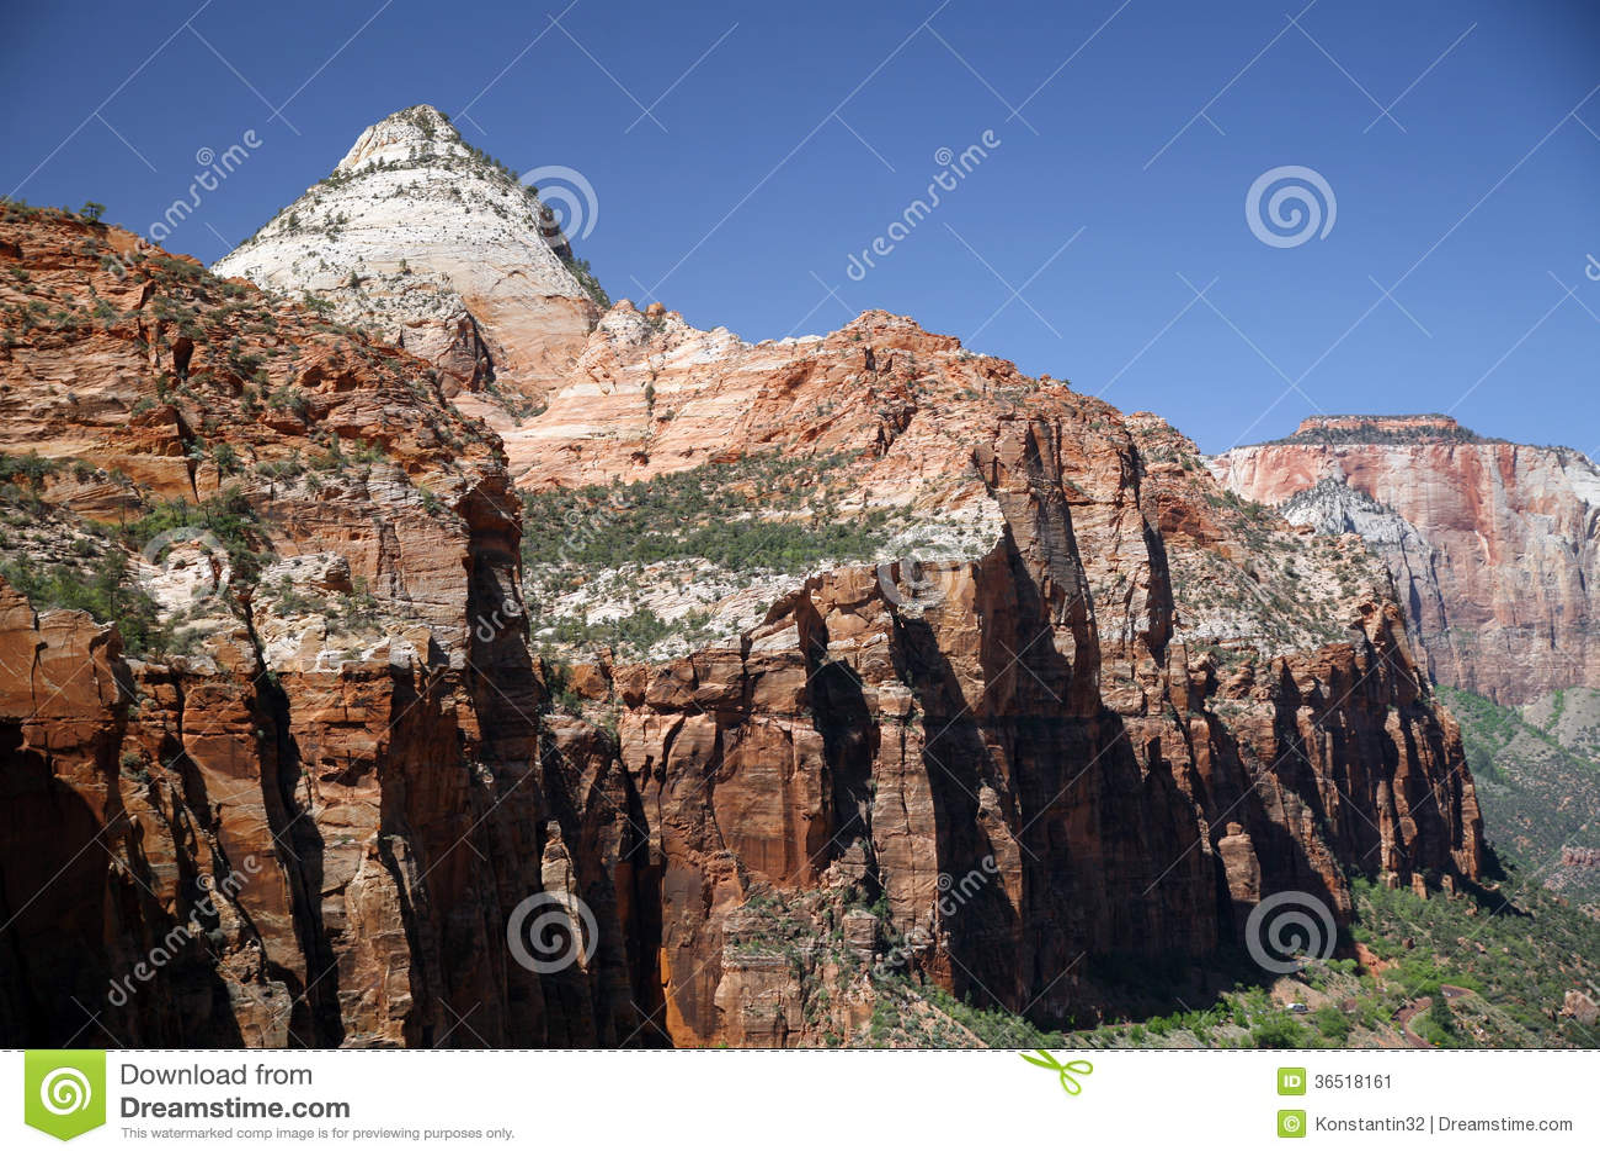 Roccia e valle in Zion National Park, Utah, U.S.A.